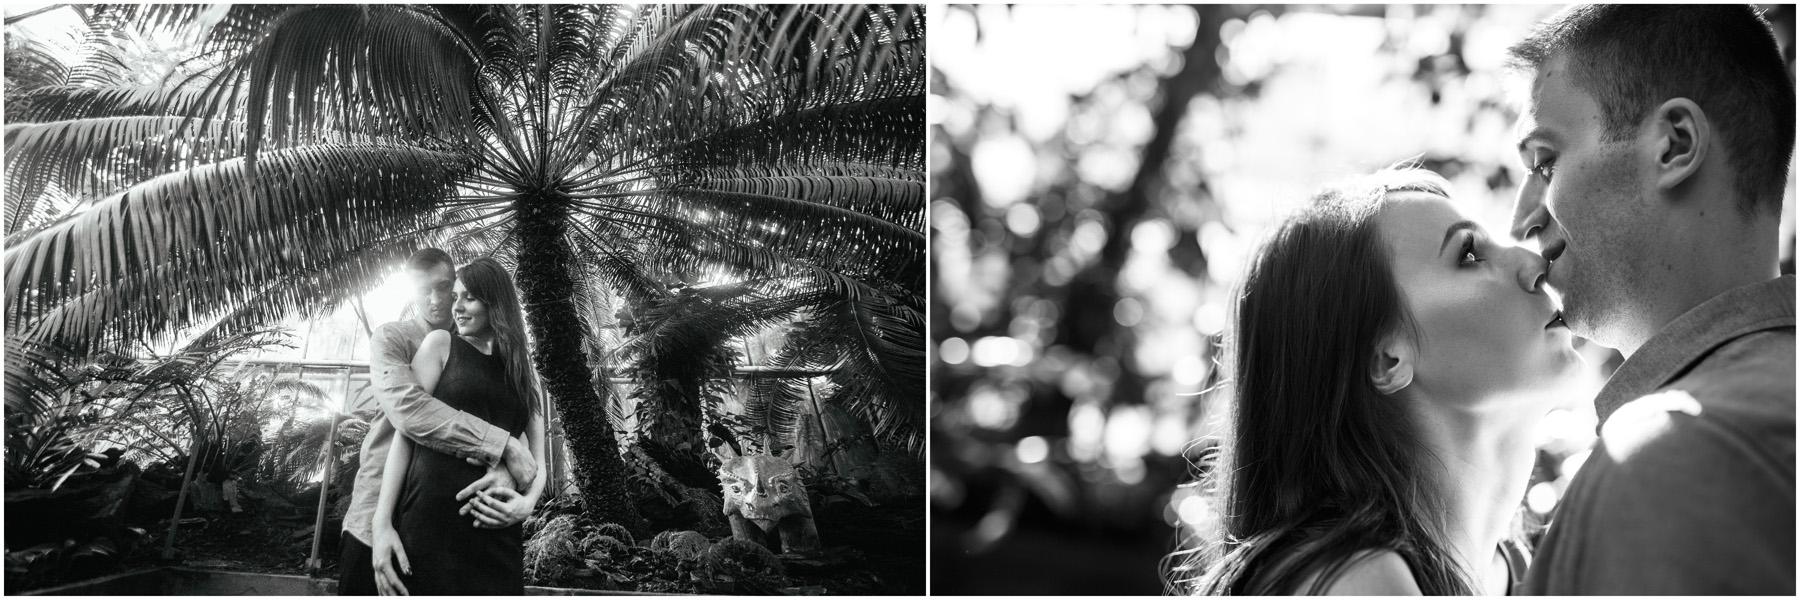 Monika & Damian | sesja w palmiarni 23